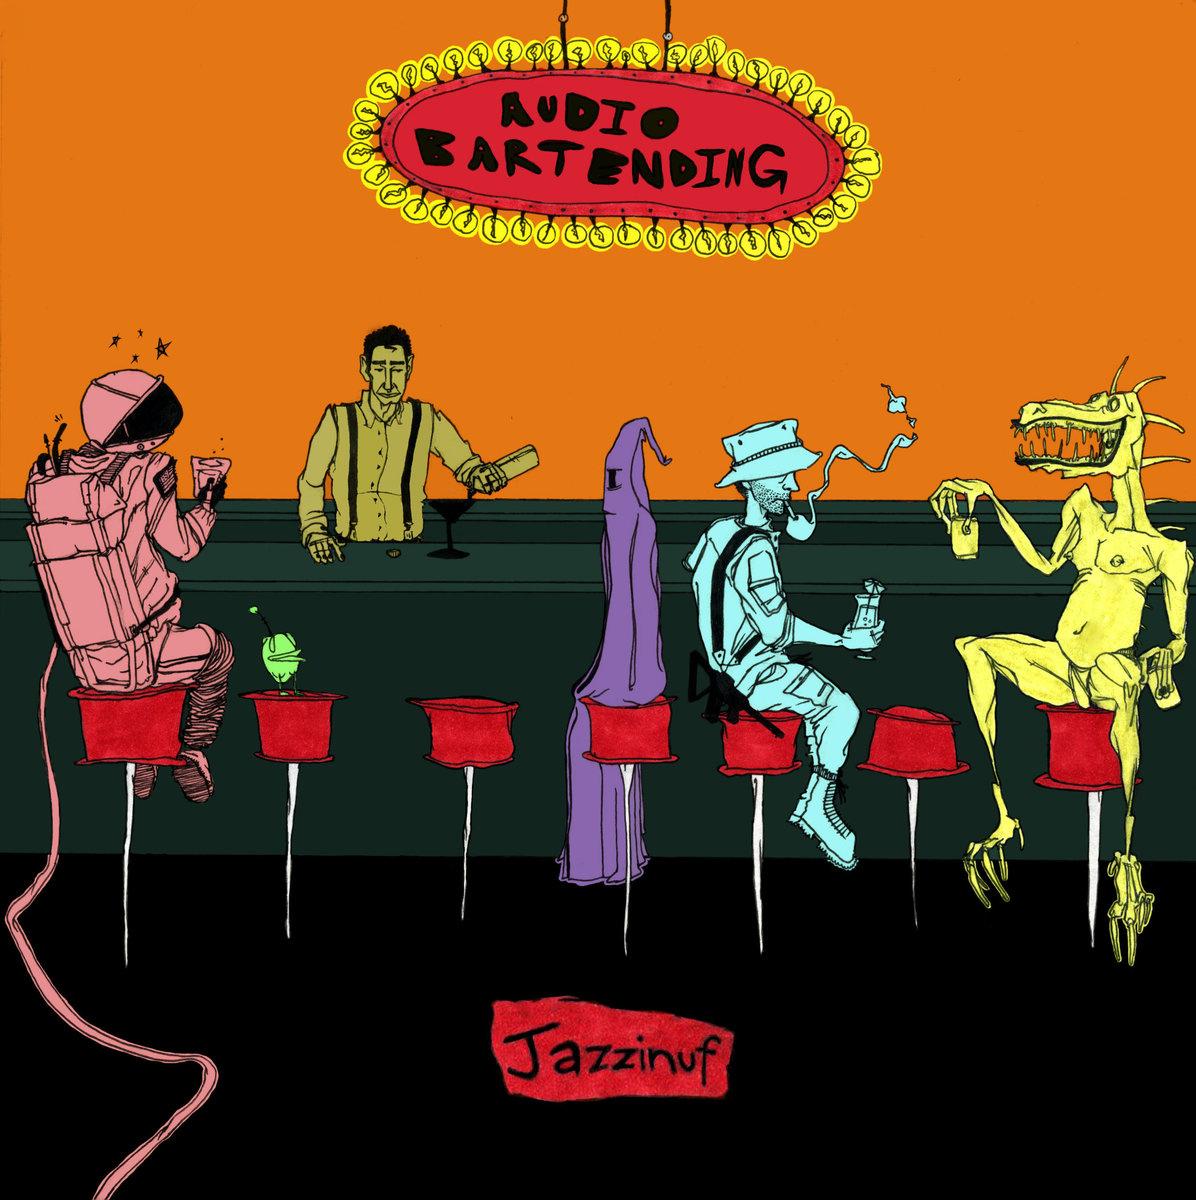 Audio Bartending by Jazzinuff